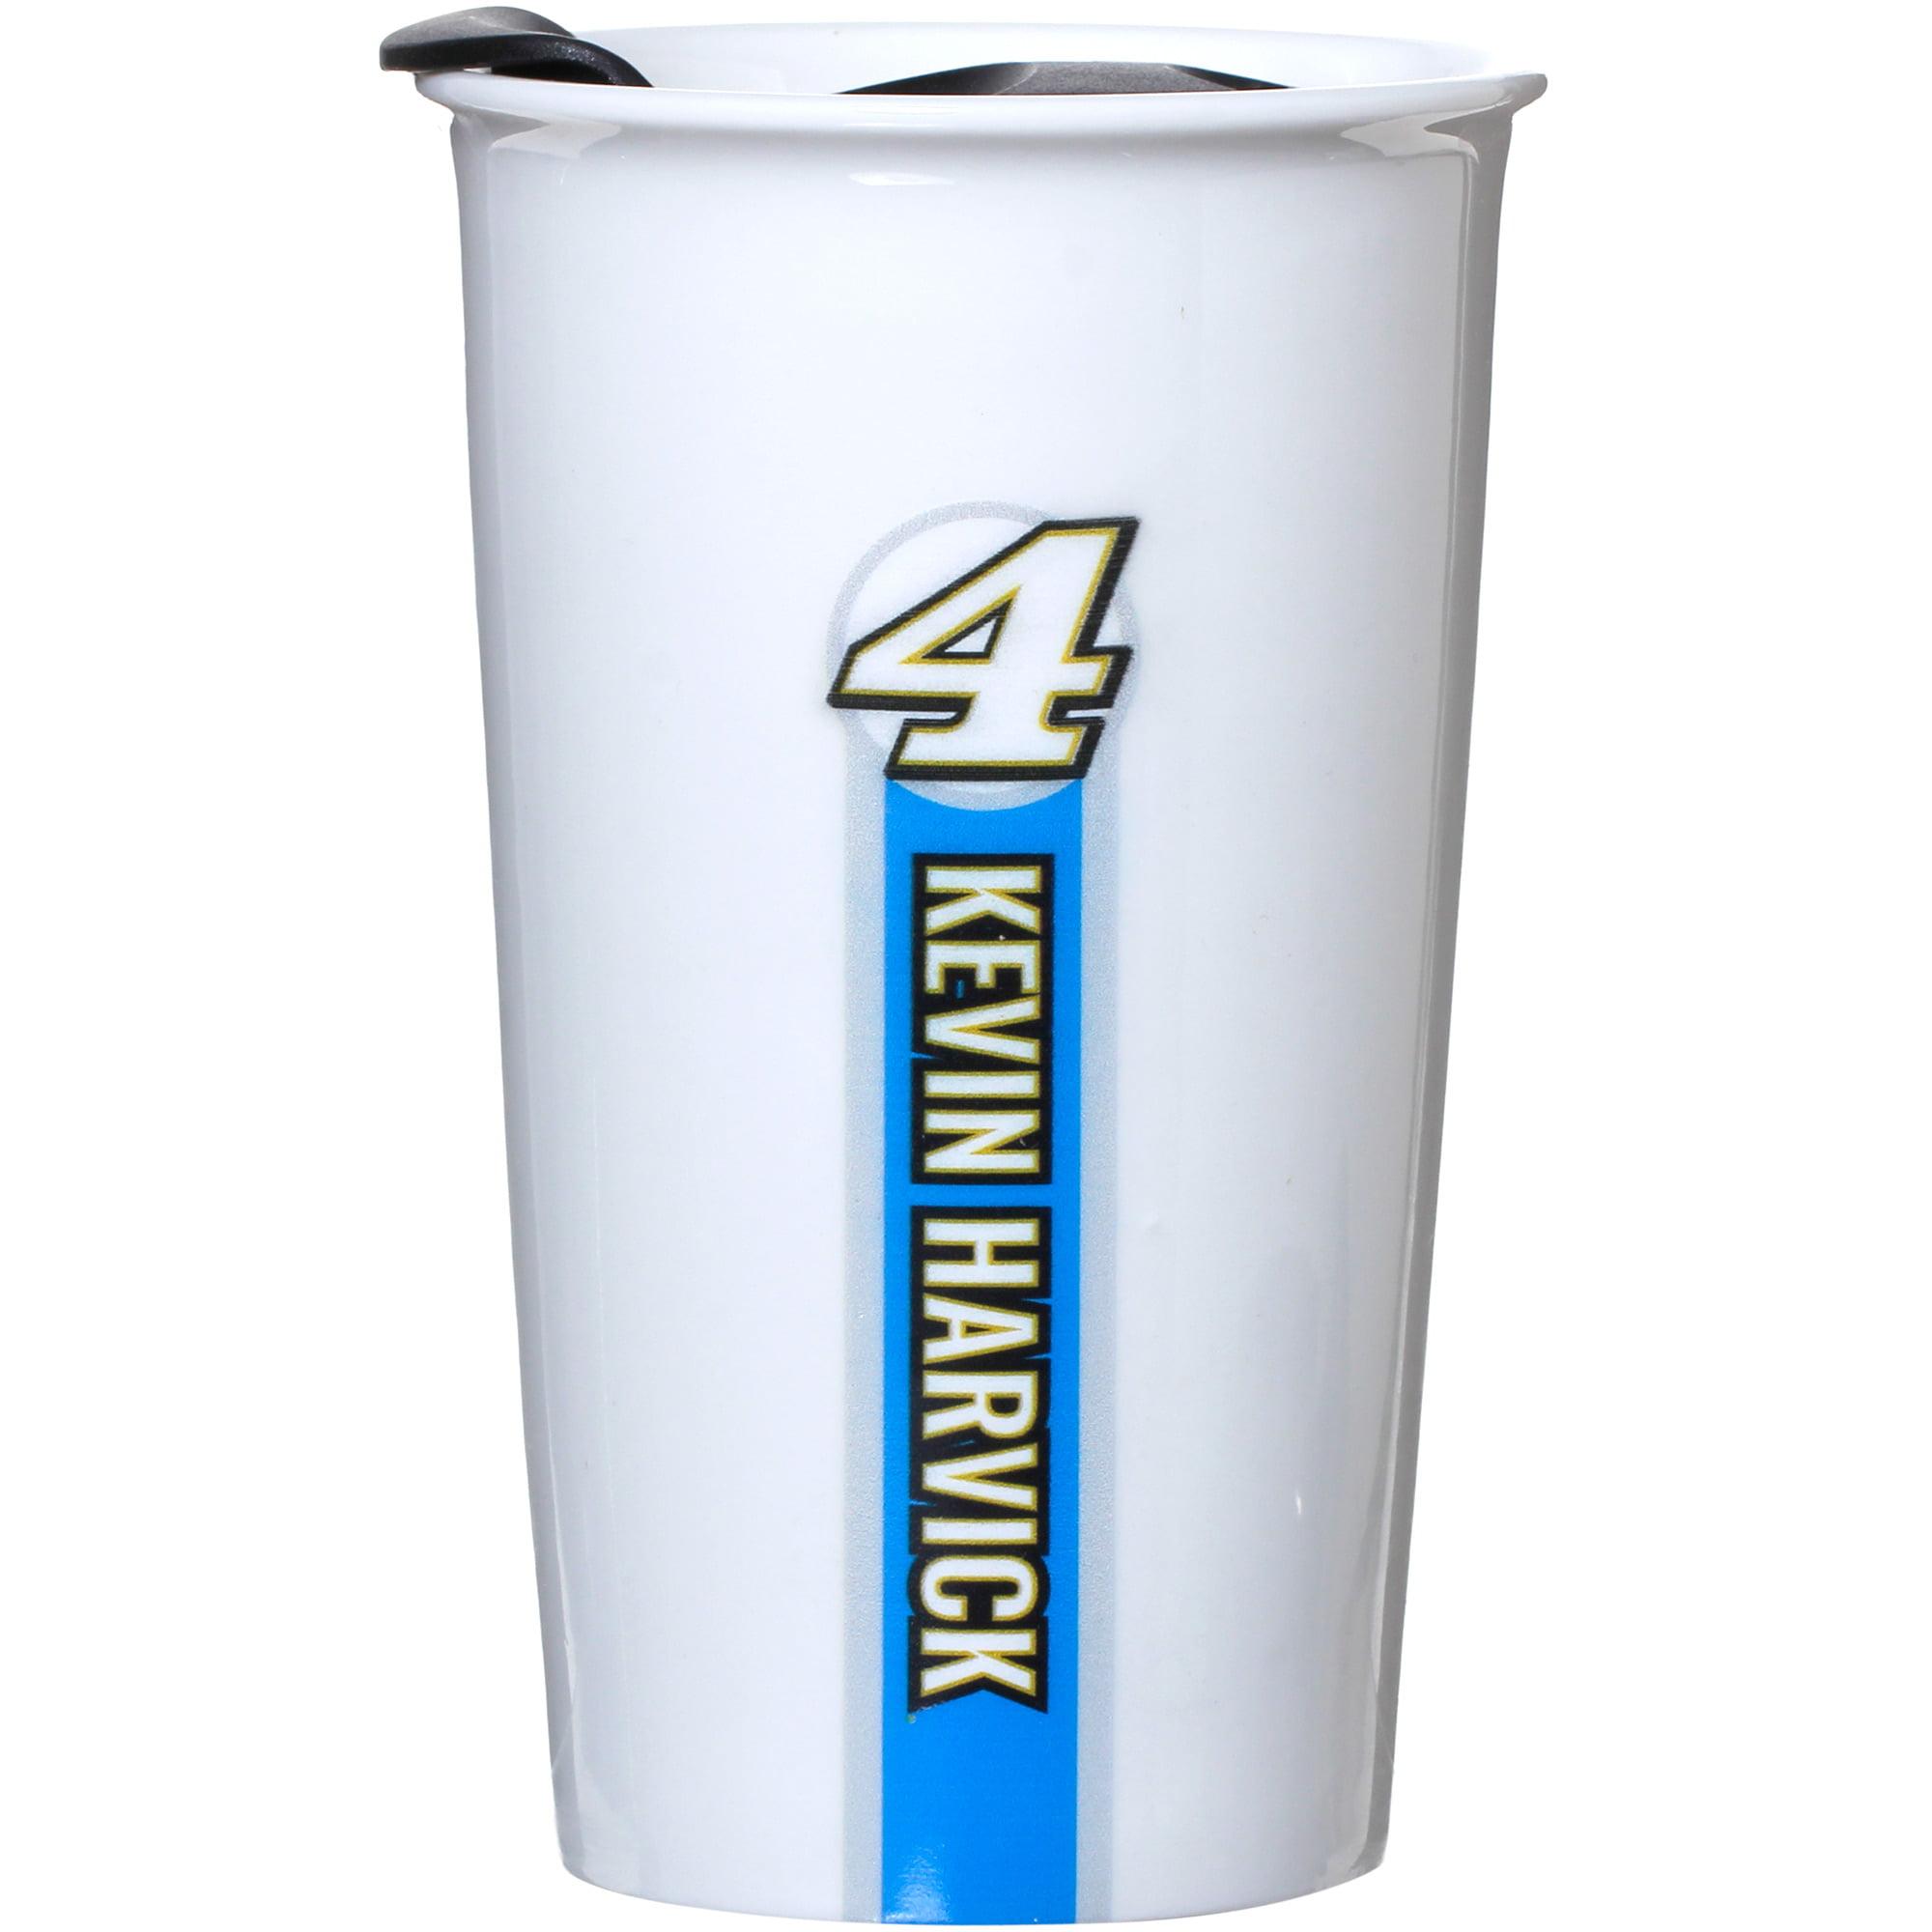 Kevin Harvick Double Wall Tumbler - No Size